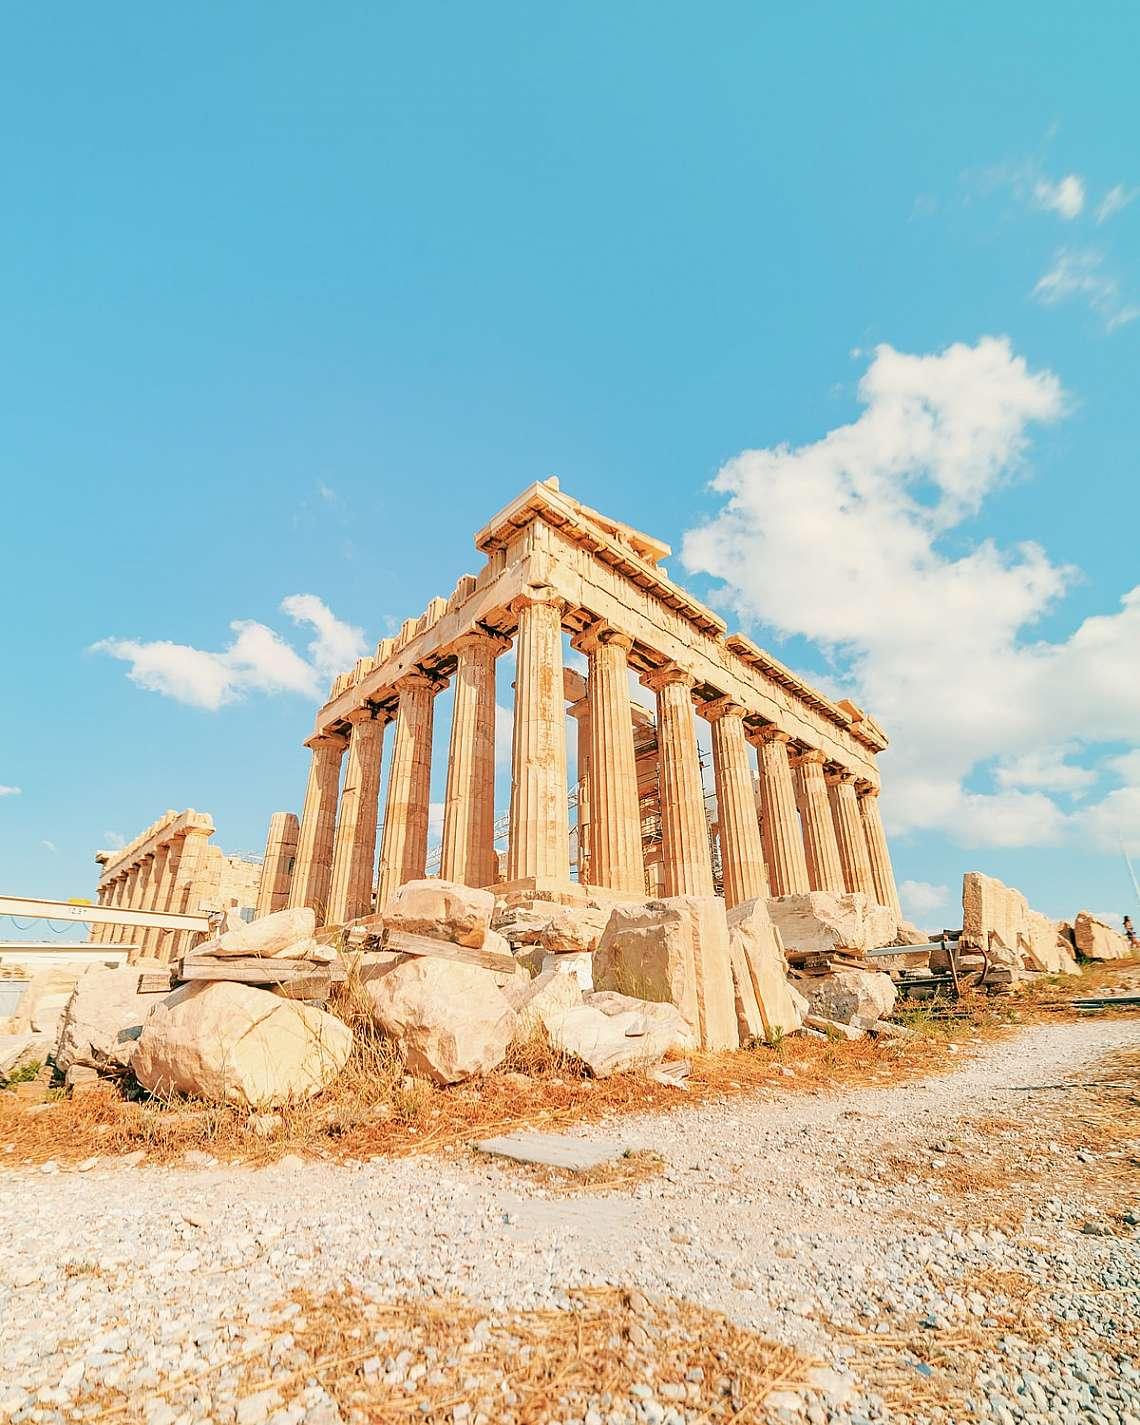 Parthenon and the Acropolis of Athens Greece